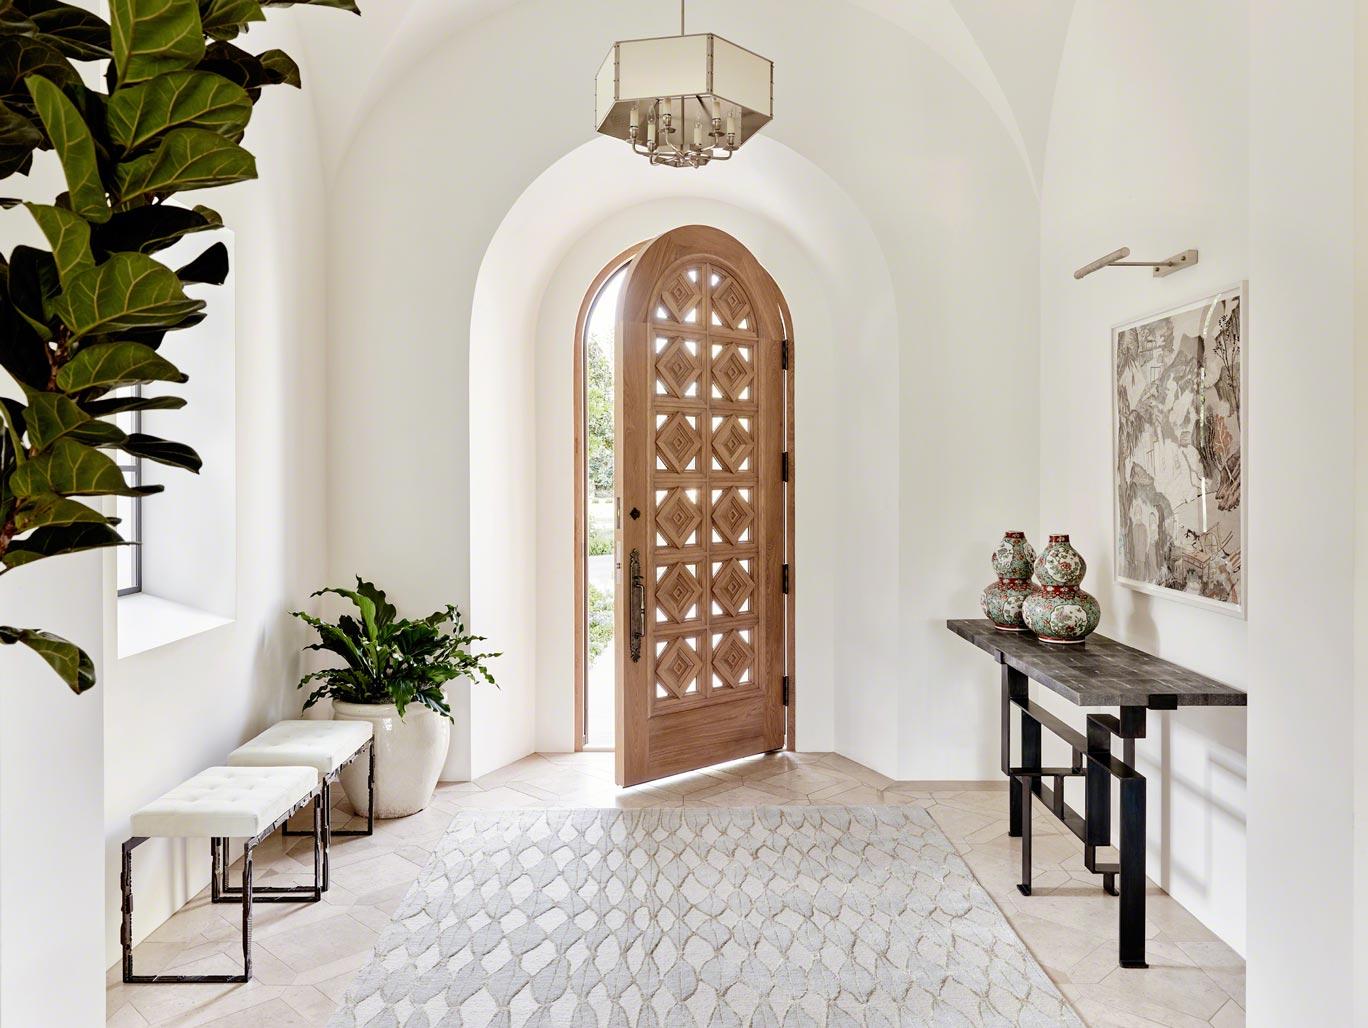 Santa Barbaran Eclectic Interior Design ǀ David Michael Miller